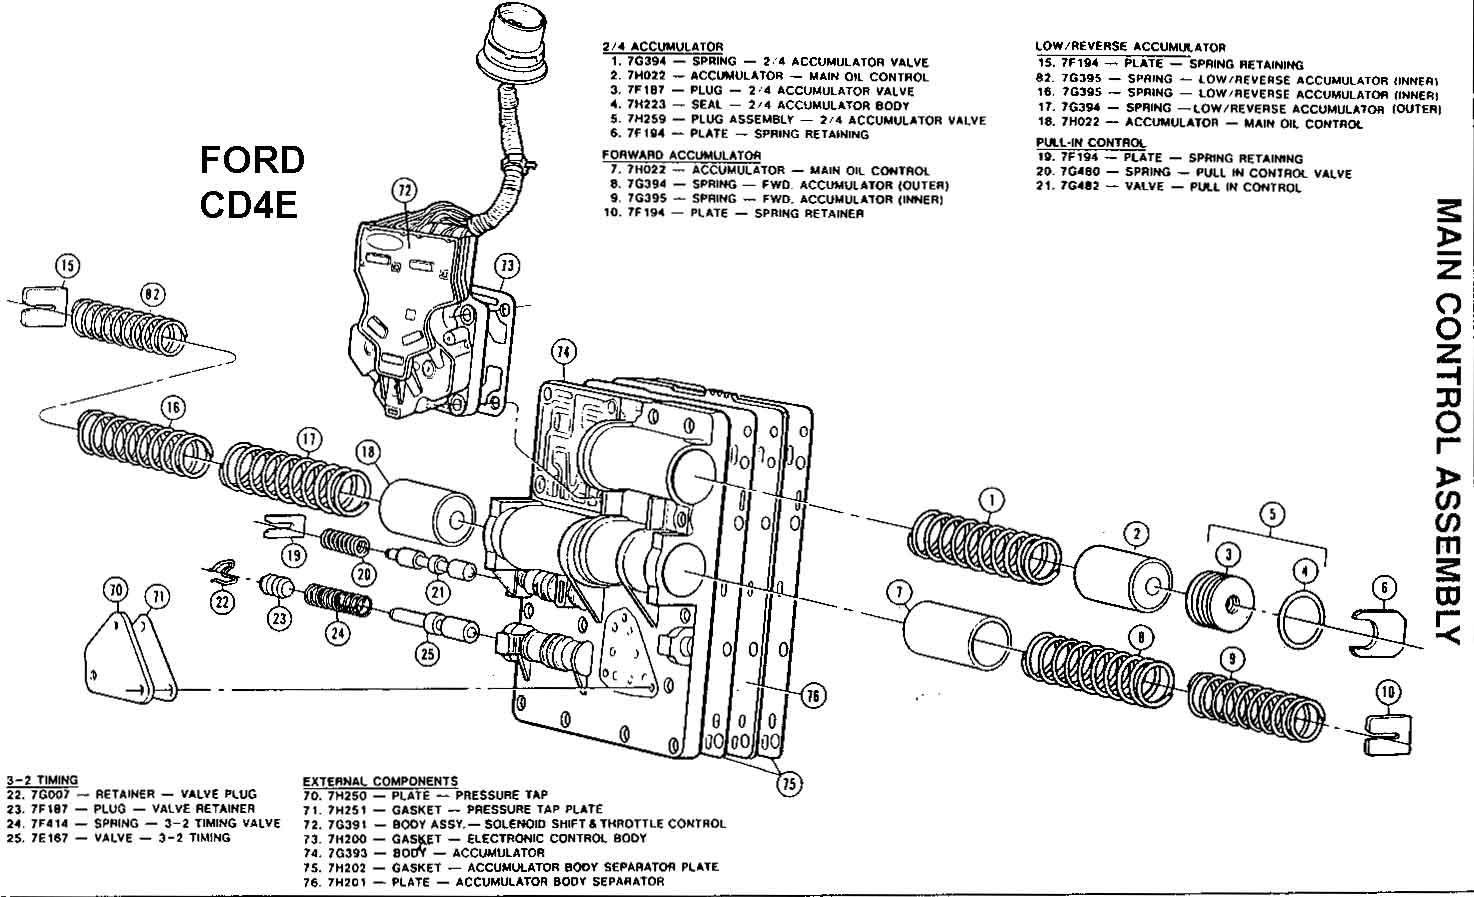 Ford Windstar Transmission Diagram Ford Auto Wiring Diagram